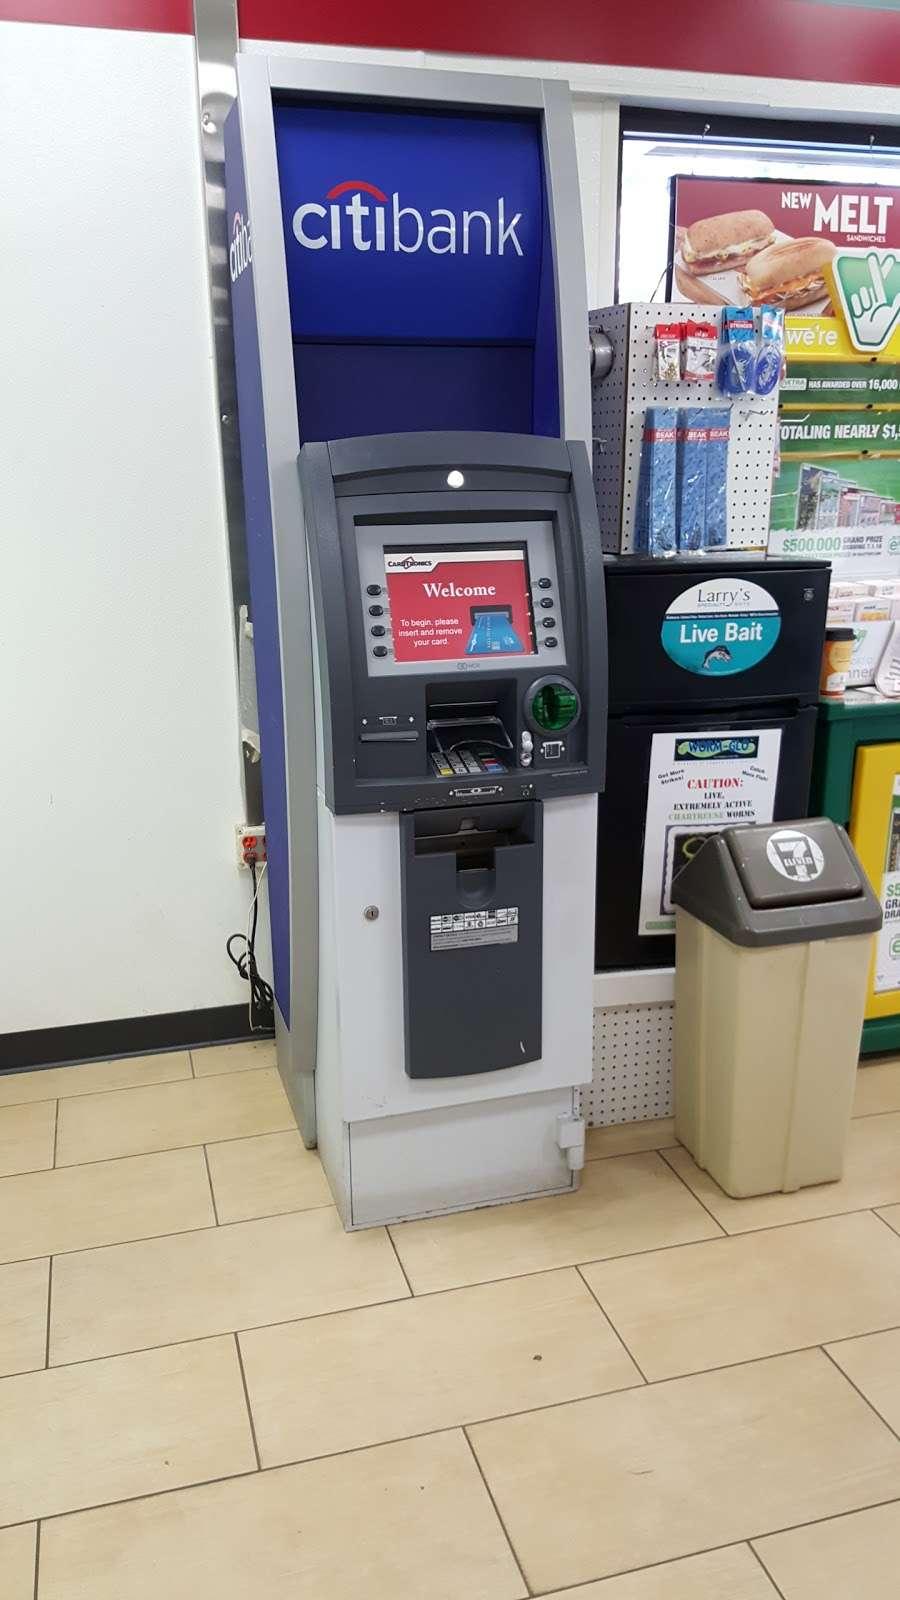 ATM (7-Eleven) - atm    Photo 1 of 1   Address: 9127 Courthouse Rd, Spotsylvania Courthouse, VA 22553, USA   Phone: (800) 627-3999